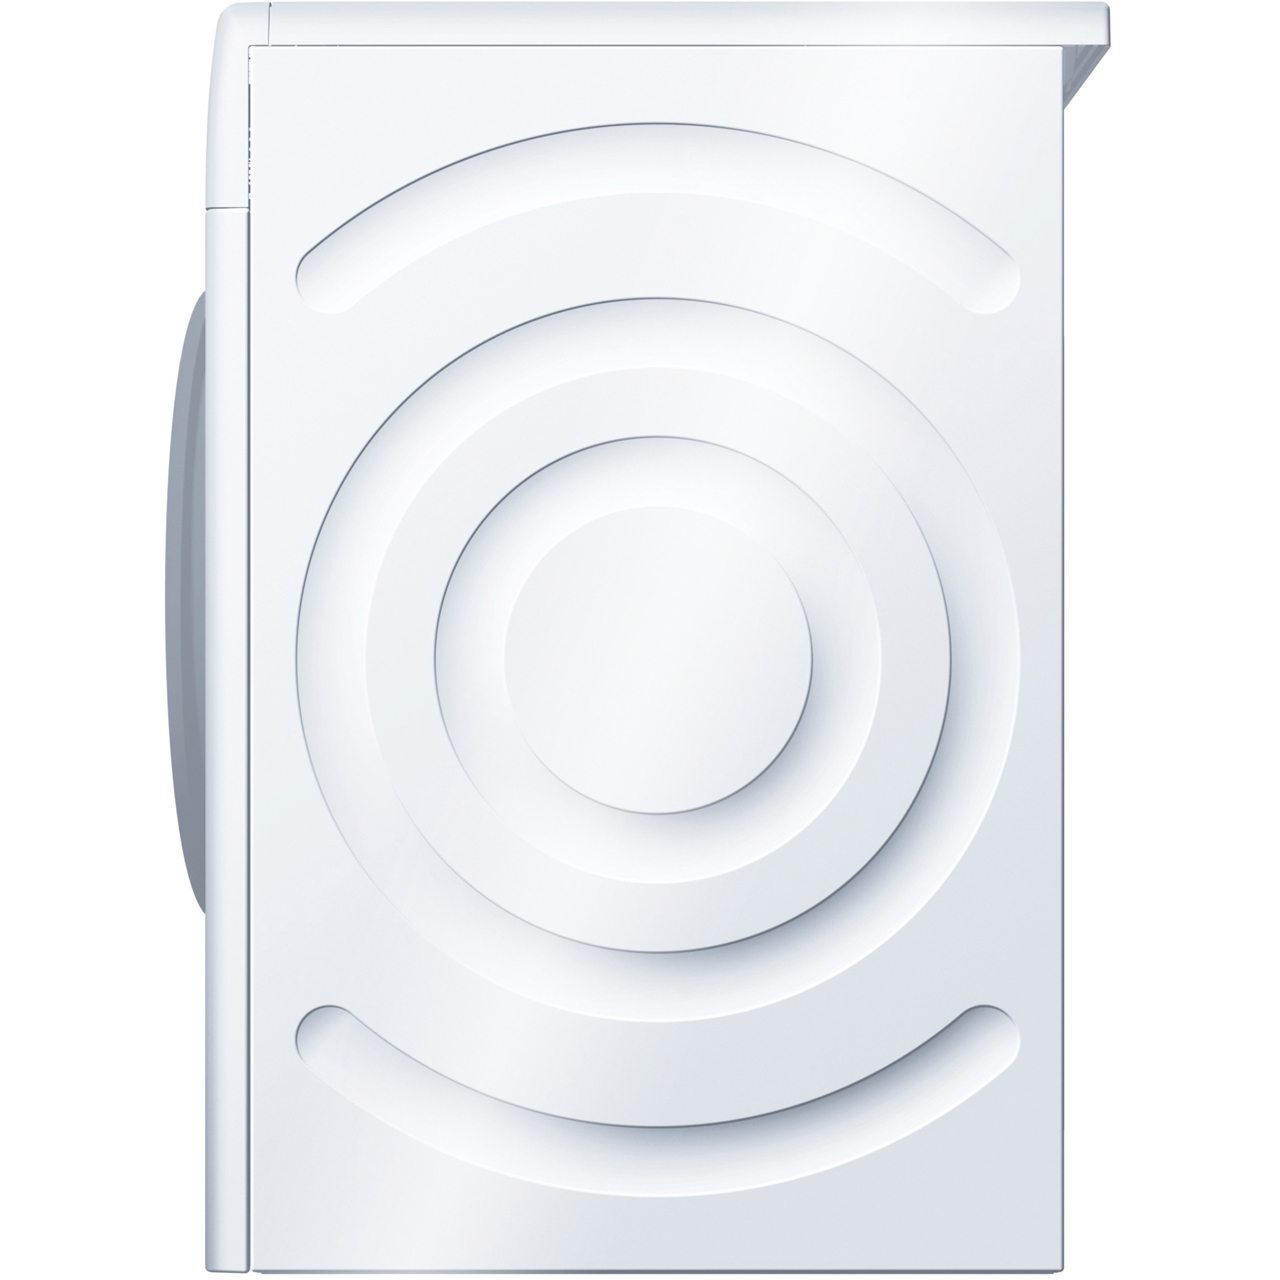 bosch serie 6 washer dryer manual